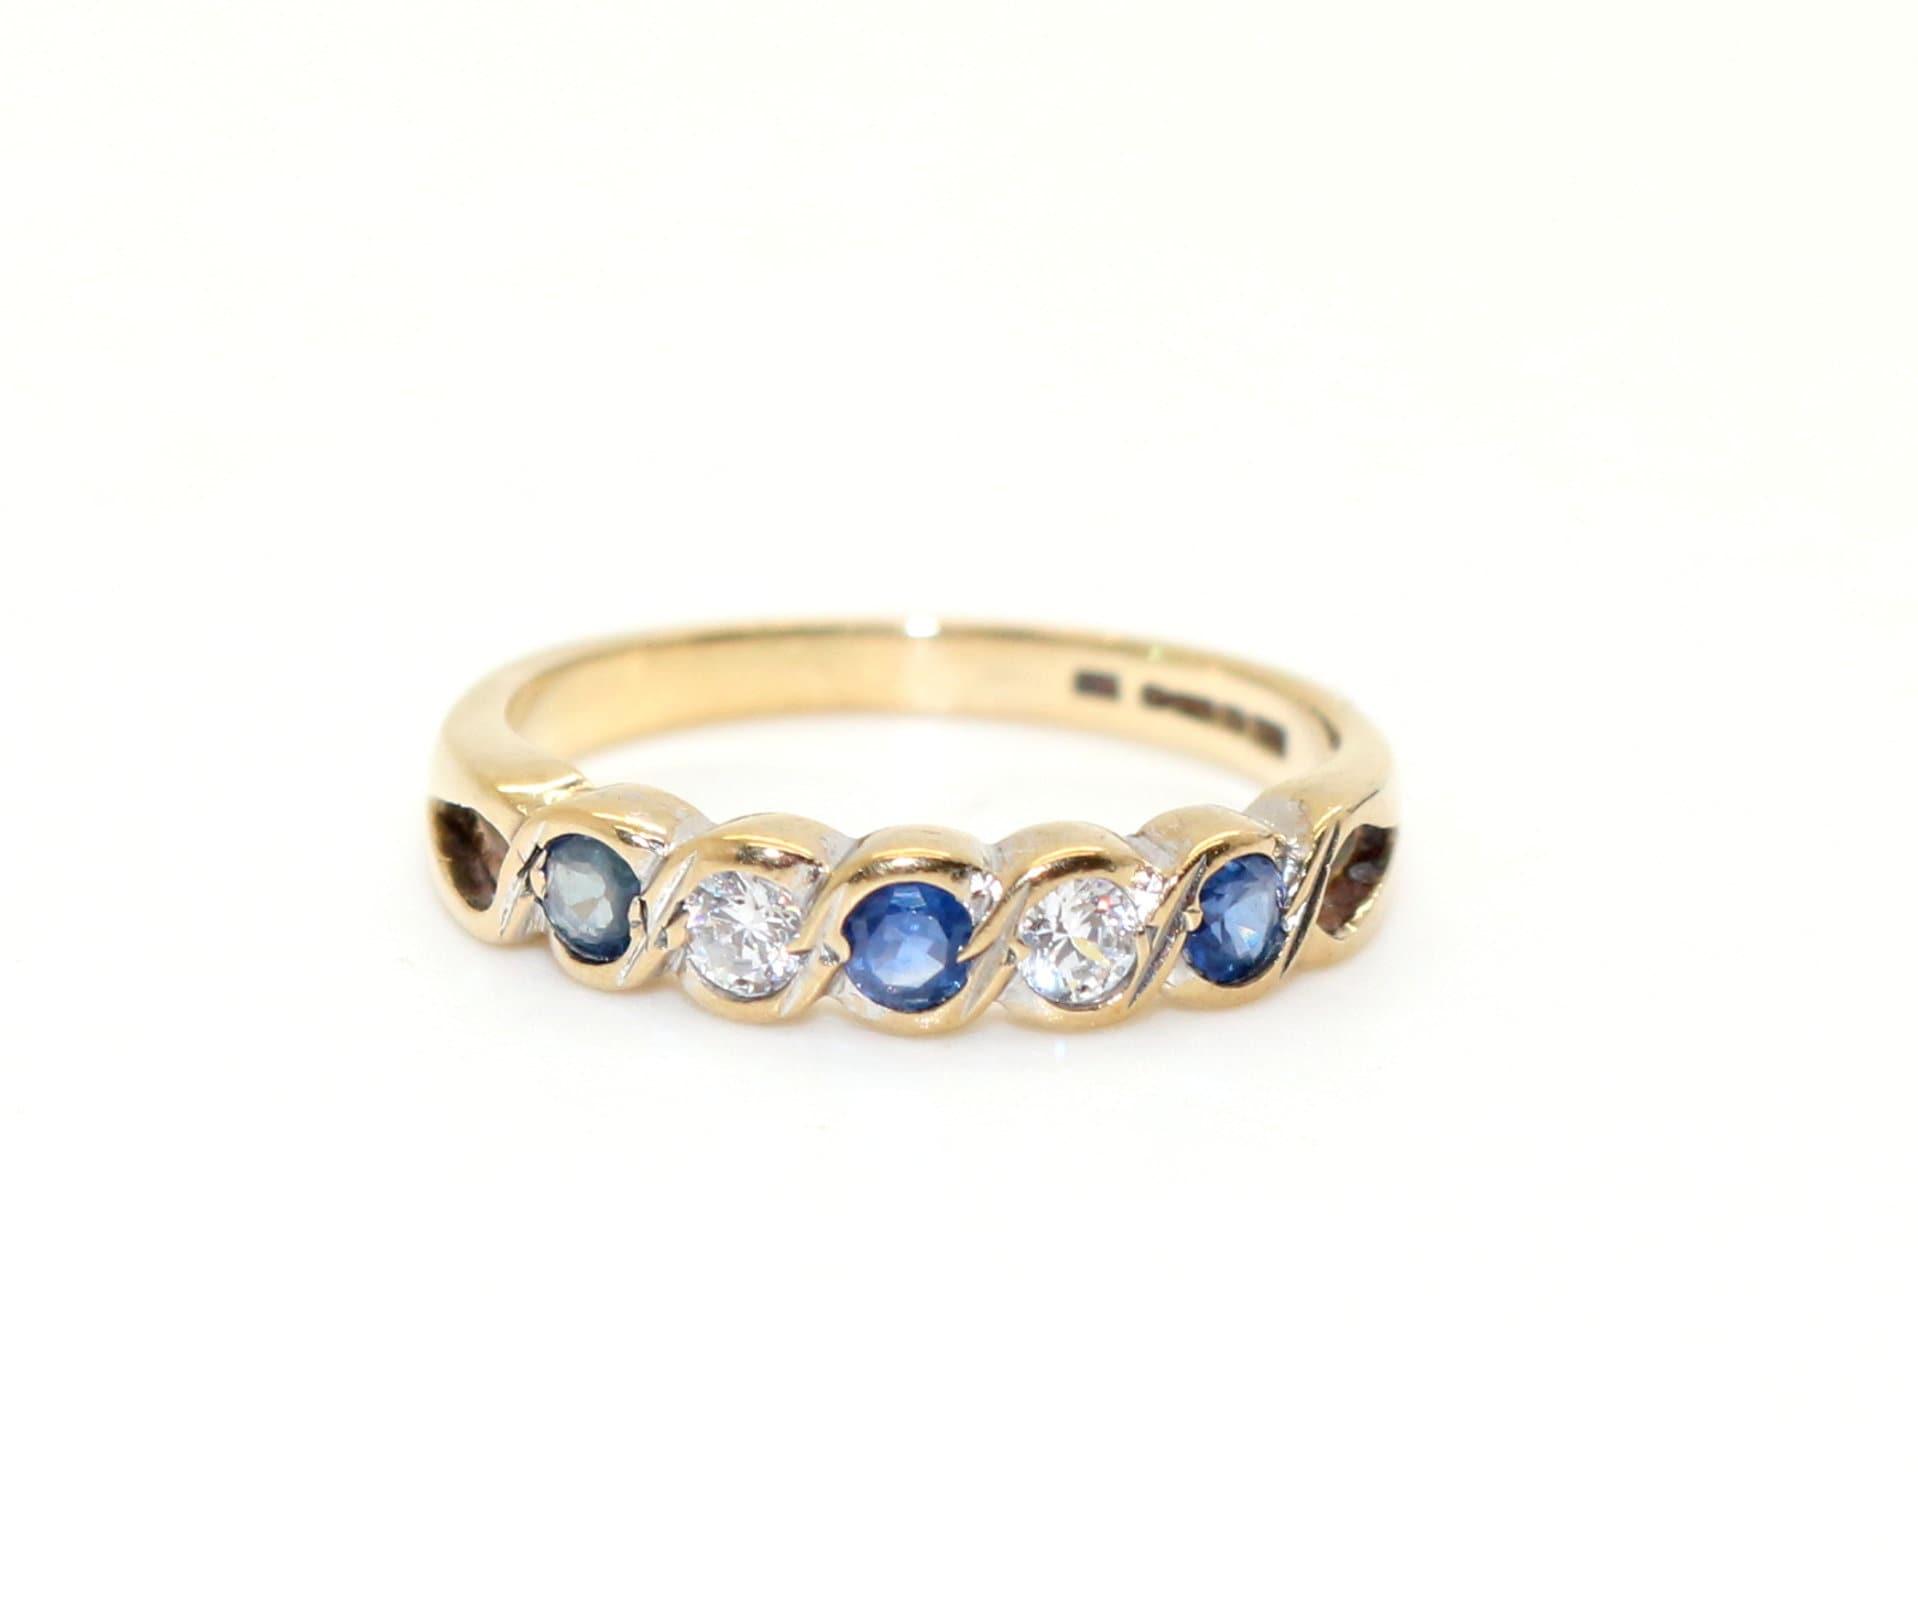 9ct Carat Yellow Gold Ladies Half Eternity Ring with Cubic Zirconia//CZ